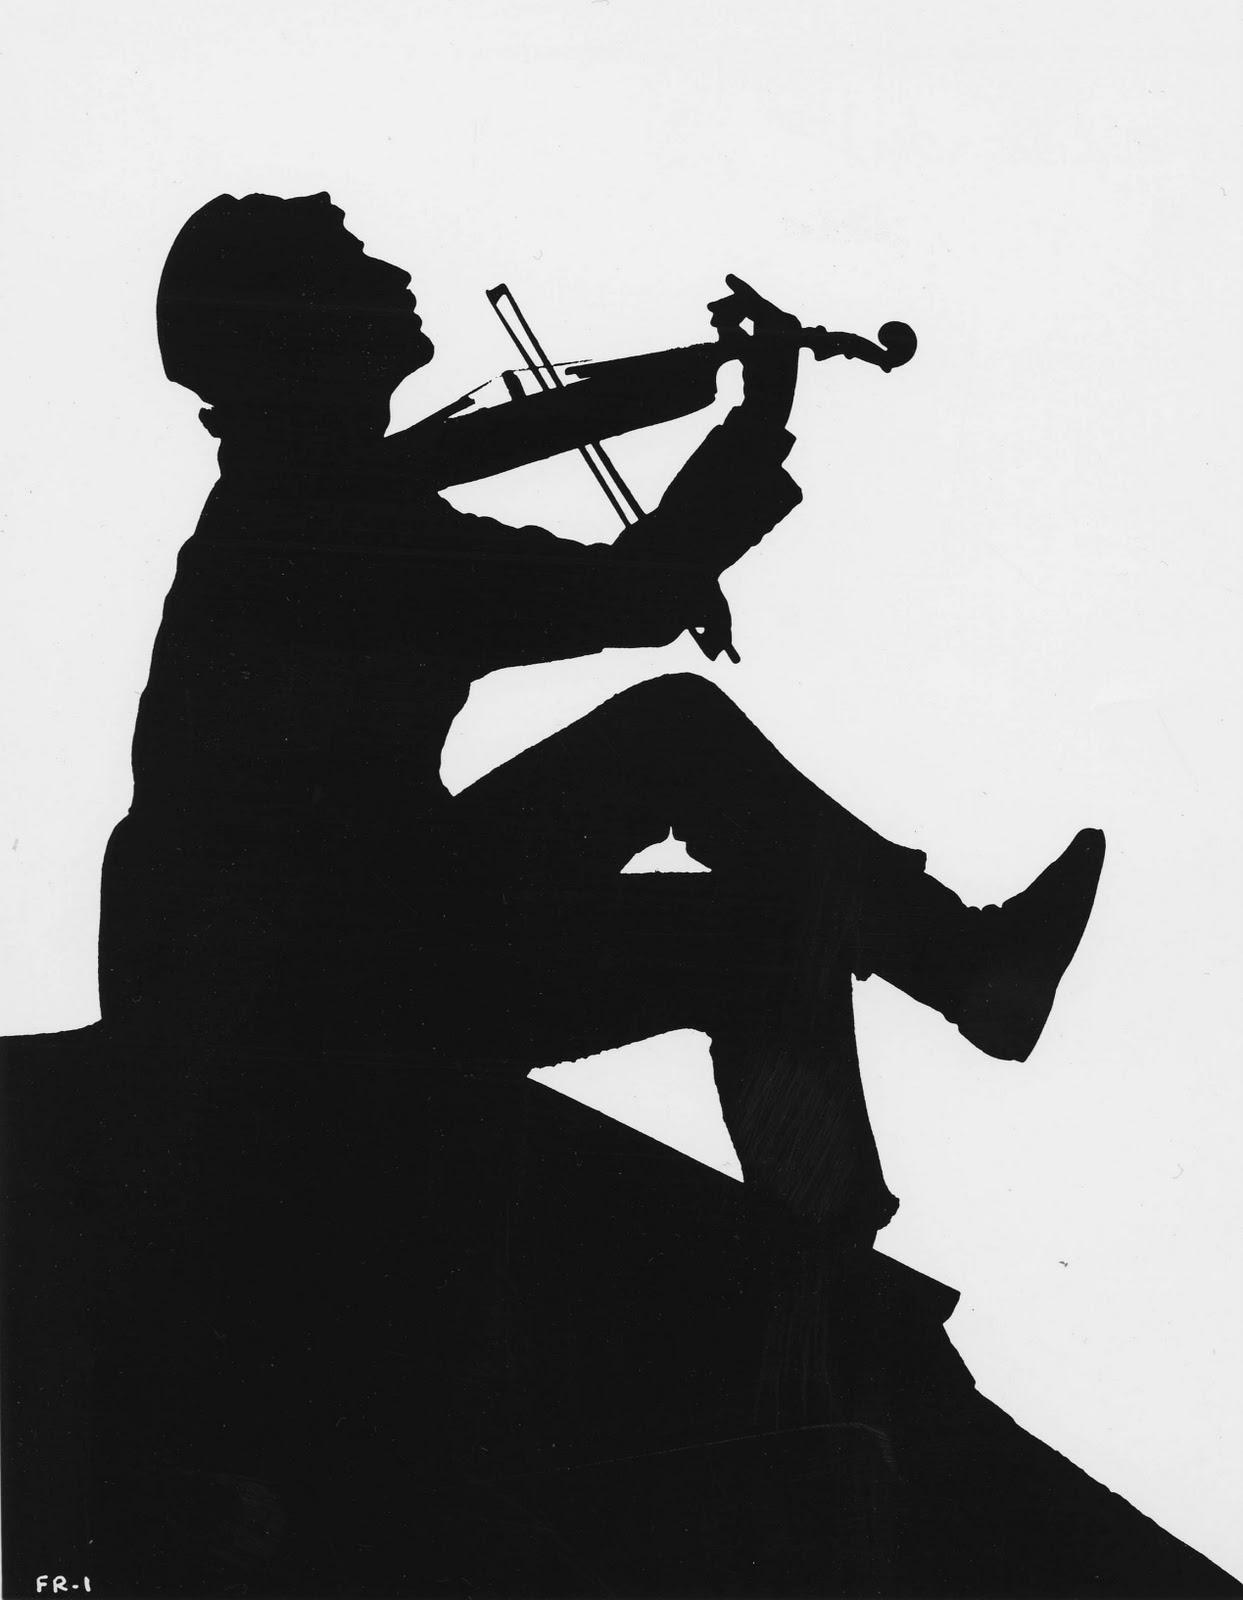 Fiddler On The Roof Clip Art.